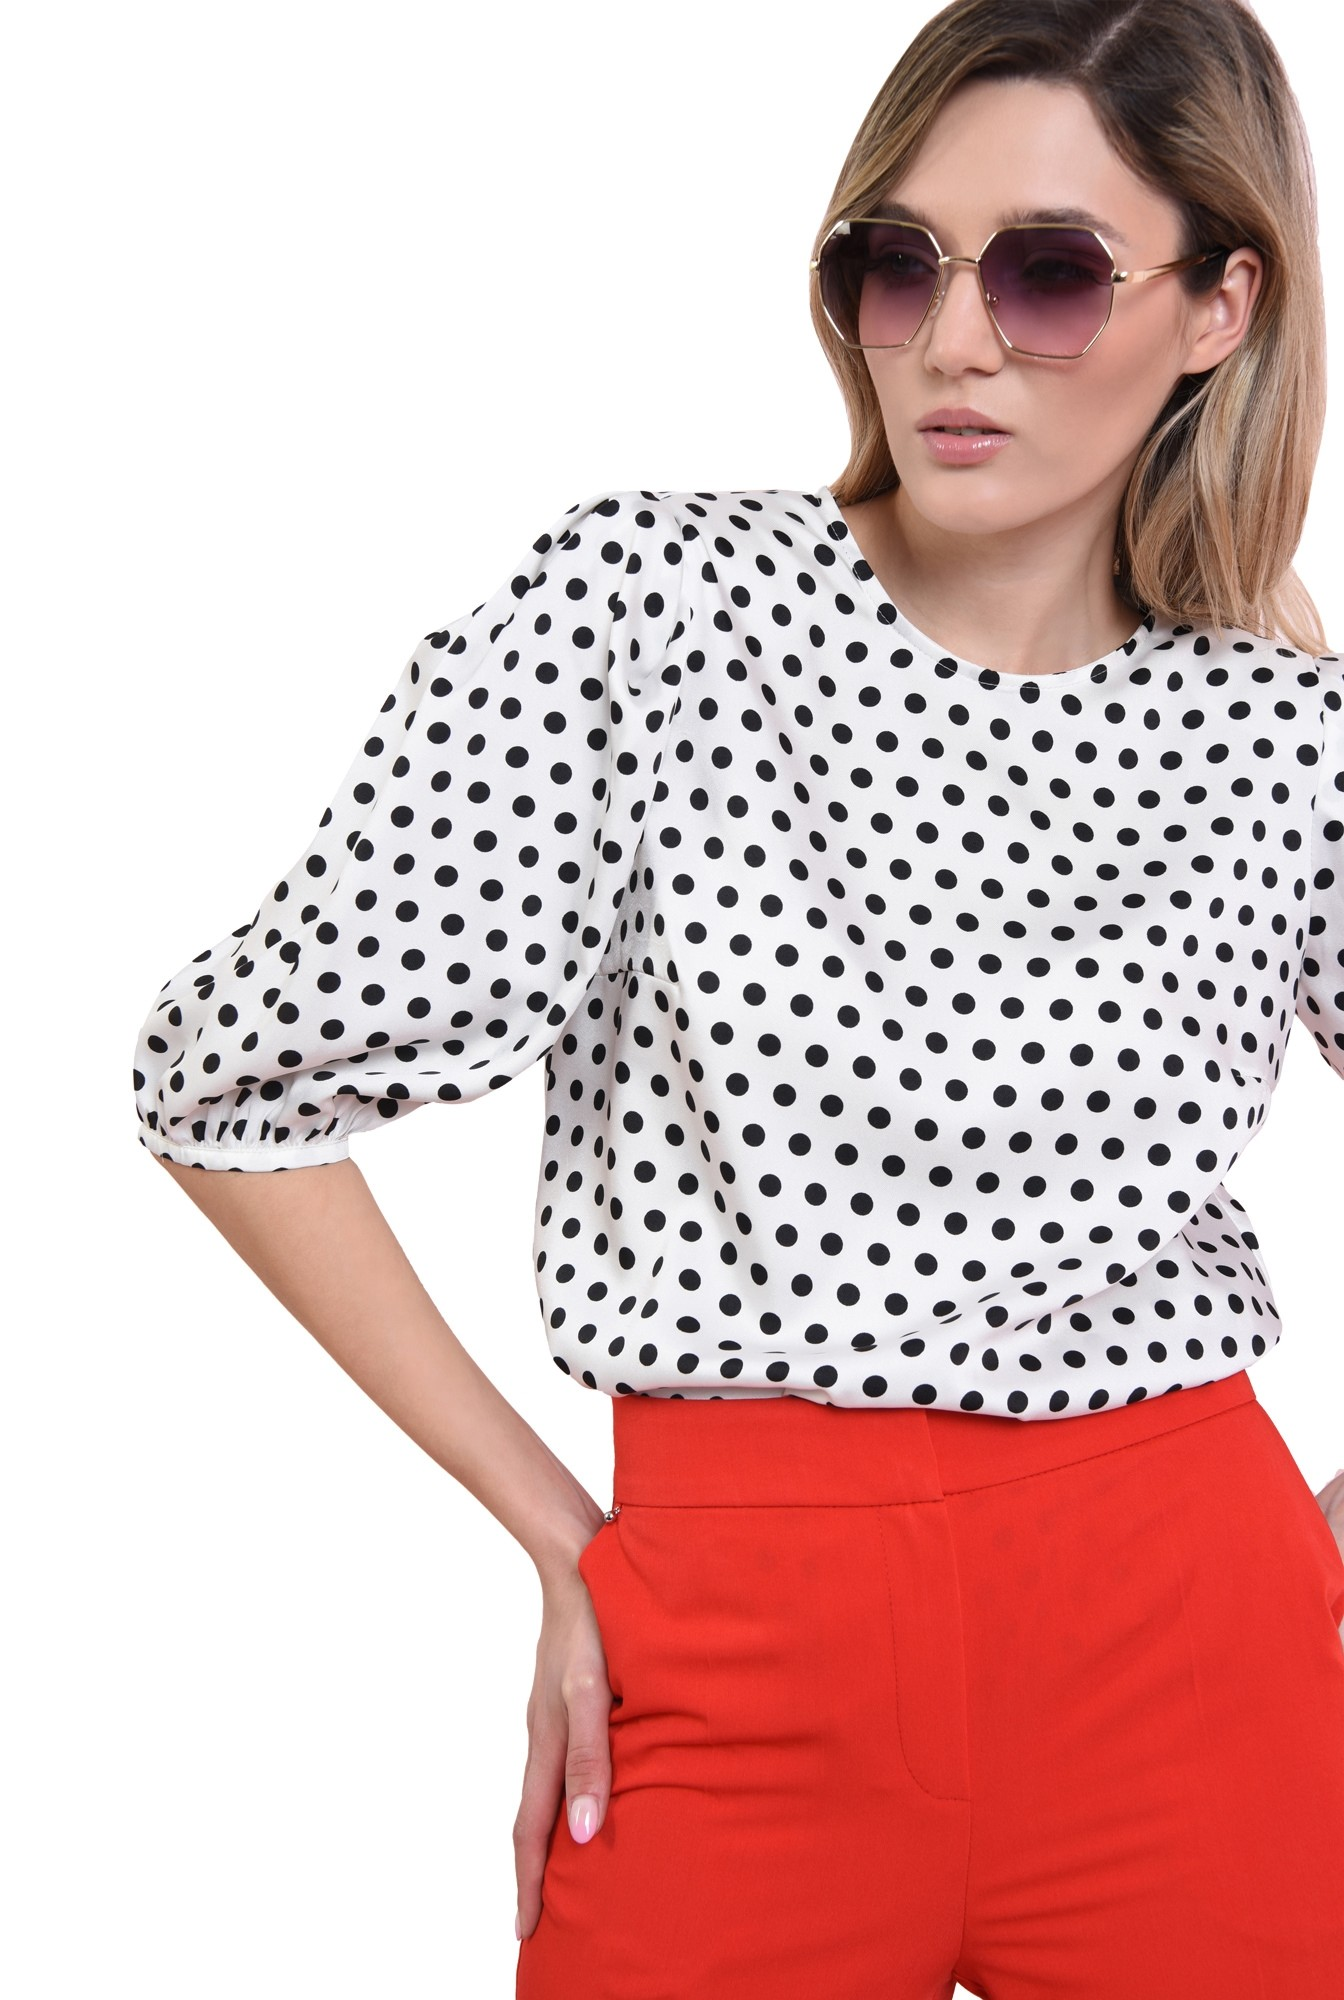 3 - bluza casual, din satin, cu buline negre